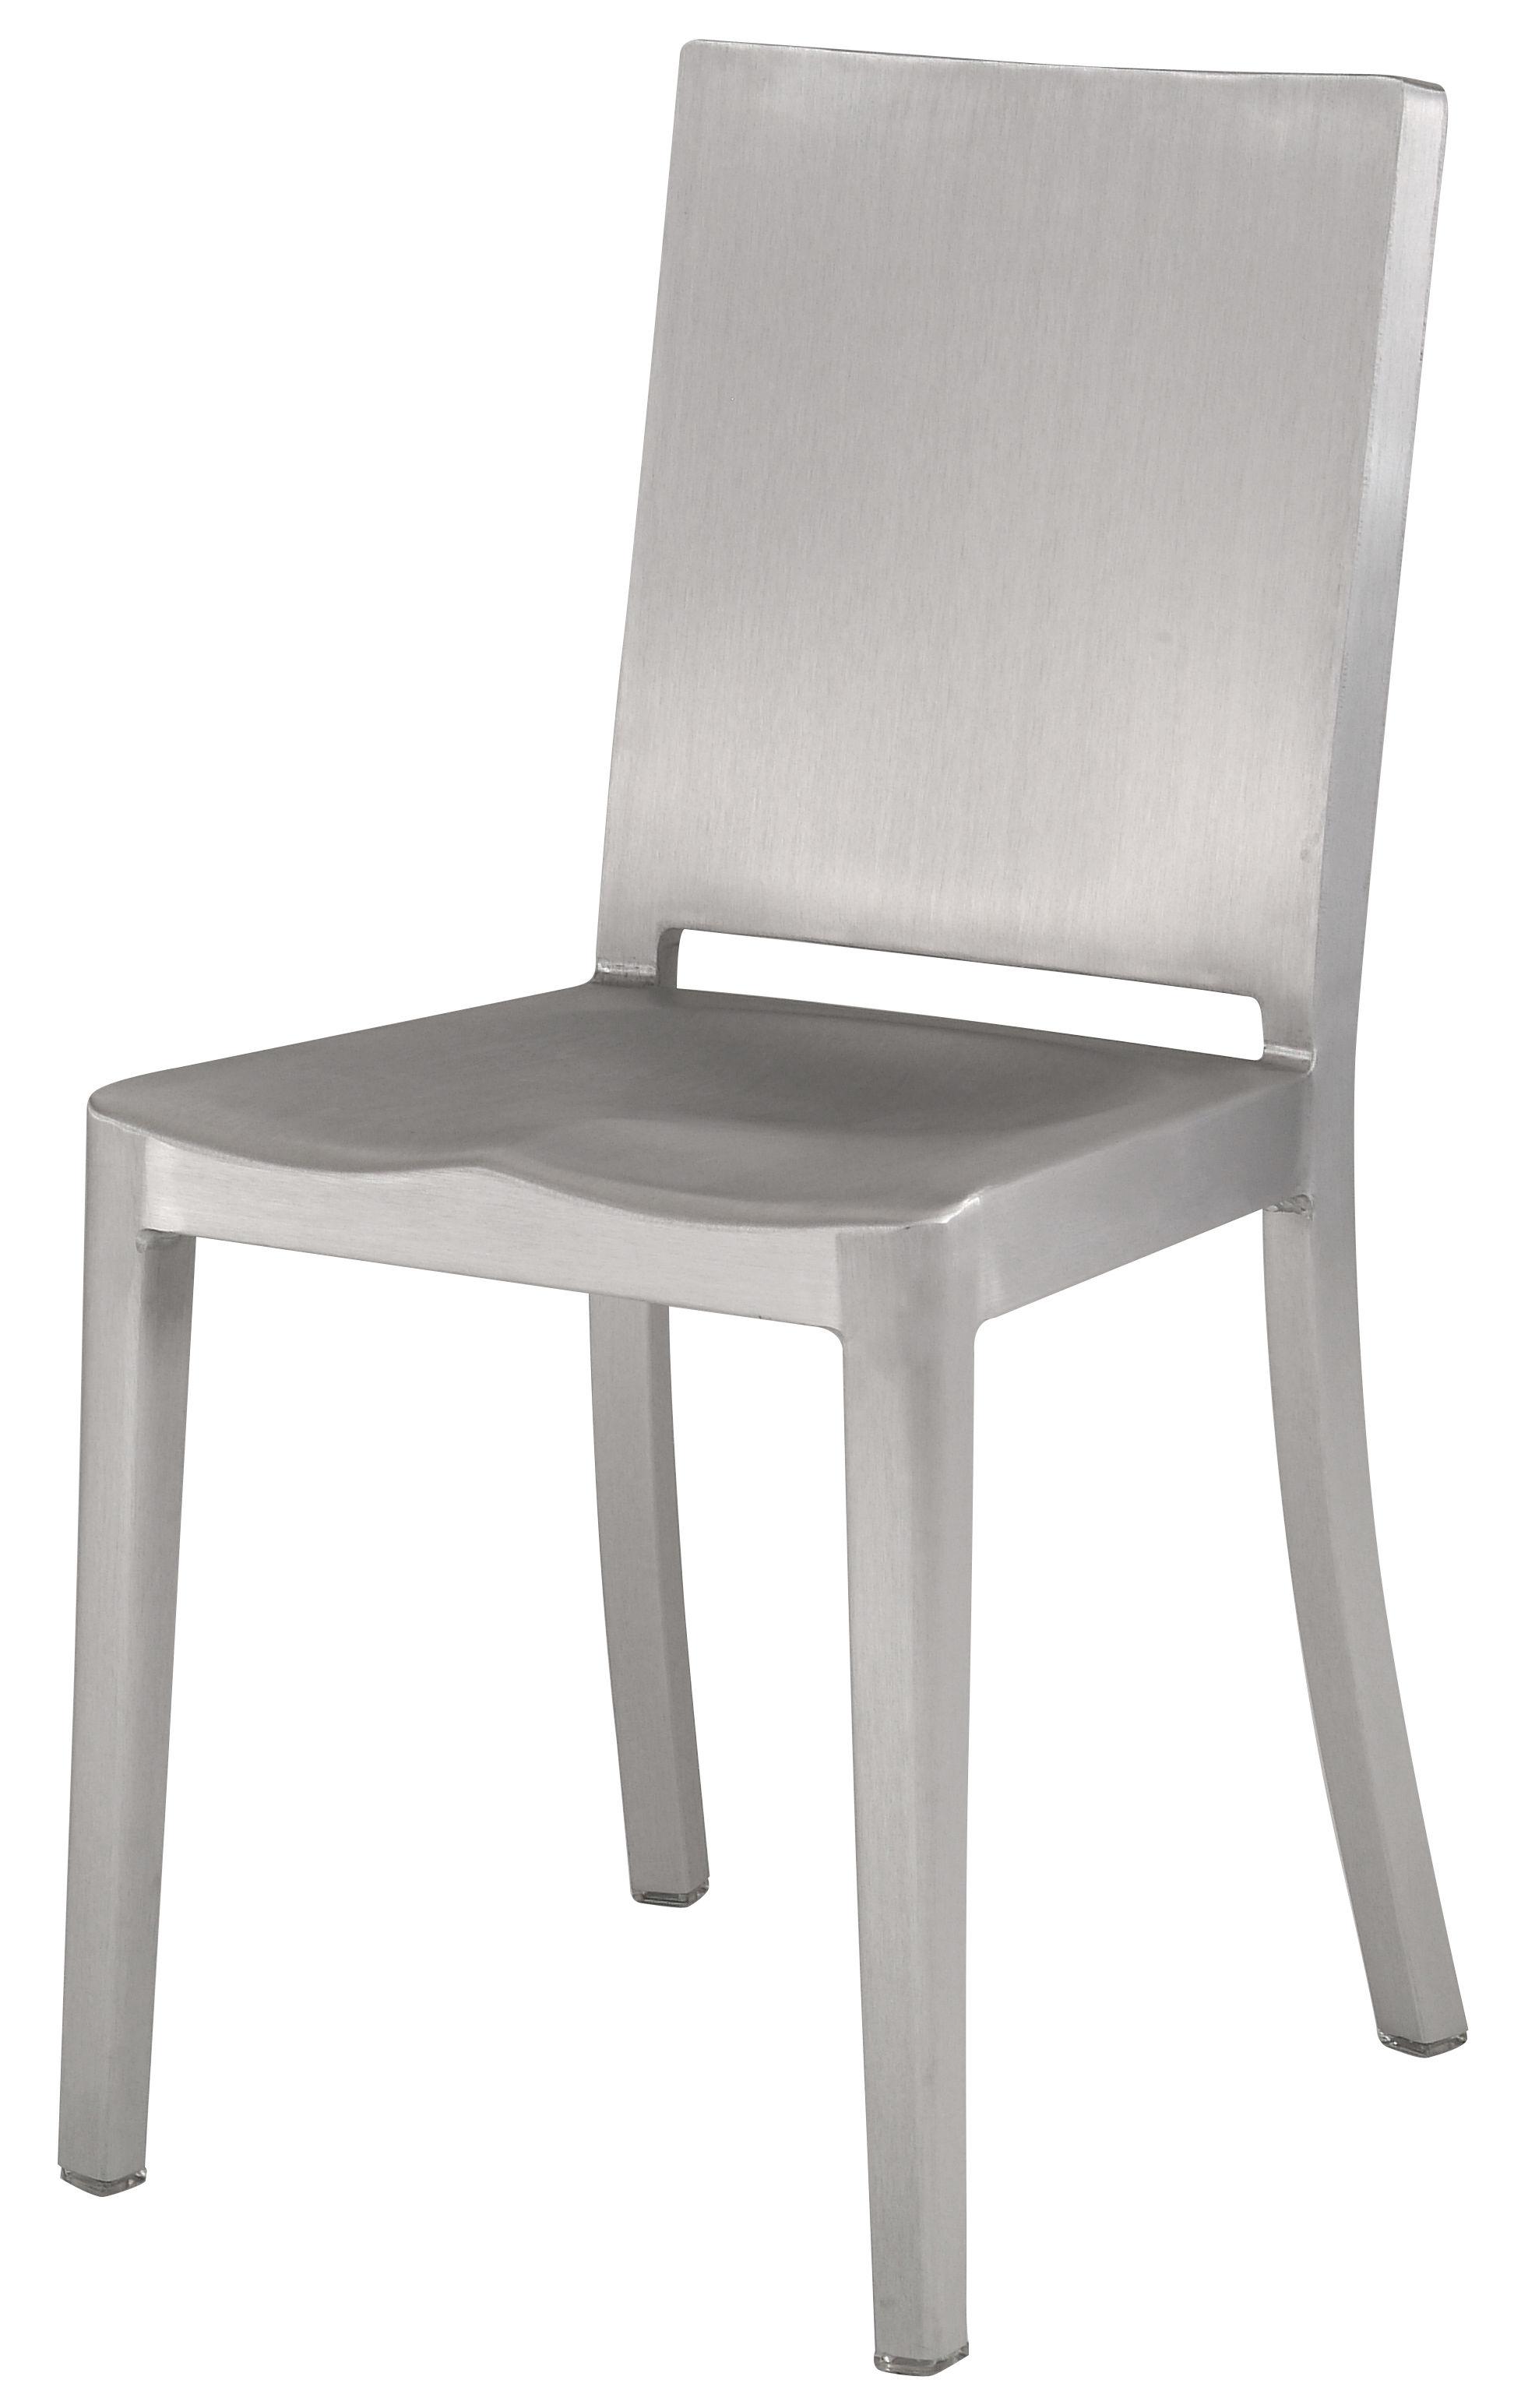 Furniture - Chairs - Hudson Outdoor Chair - Aluminium by Emeco - Brushed aluminium - Recycled brushed aluminium